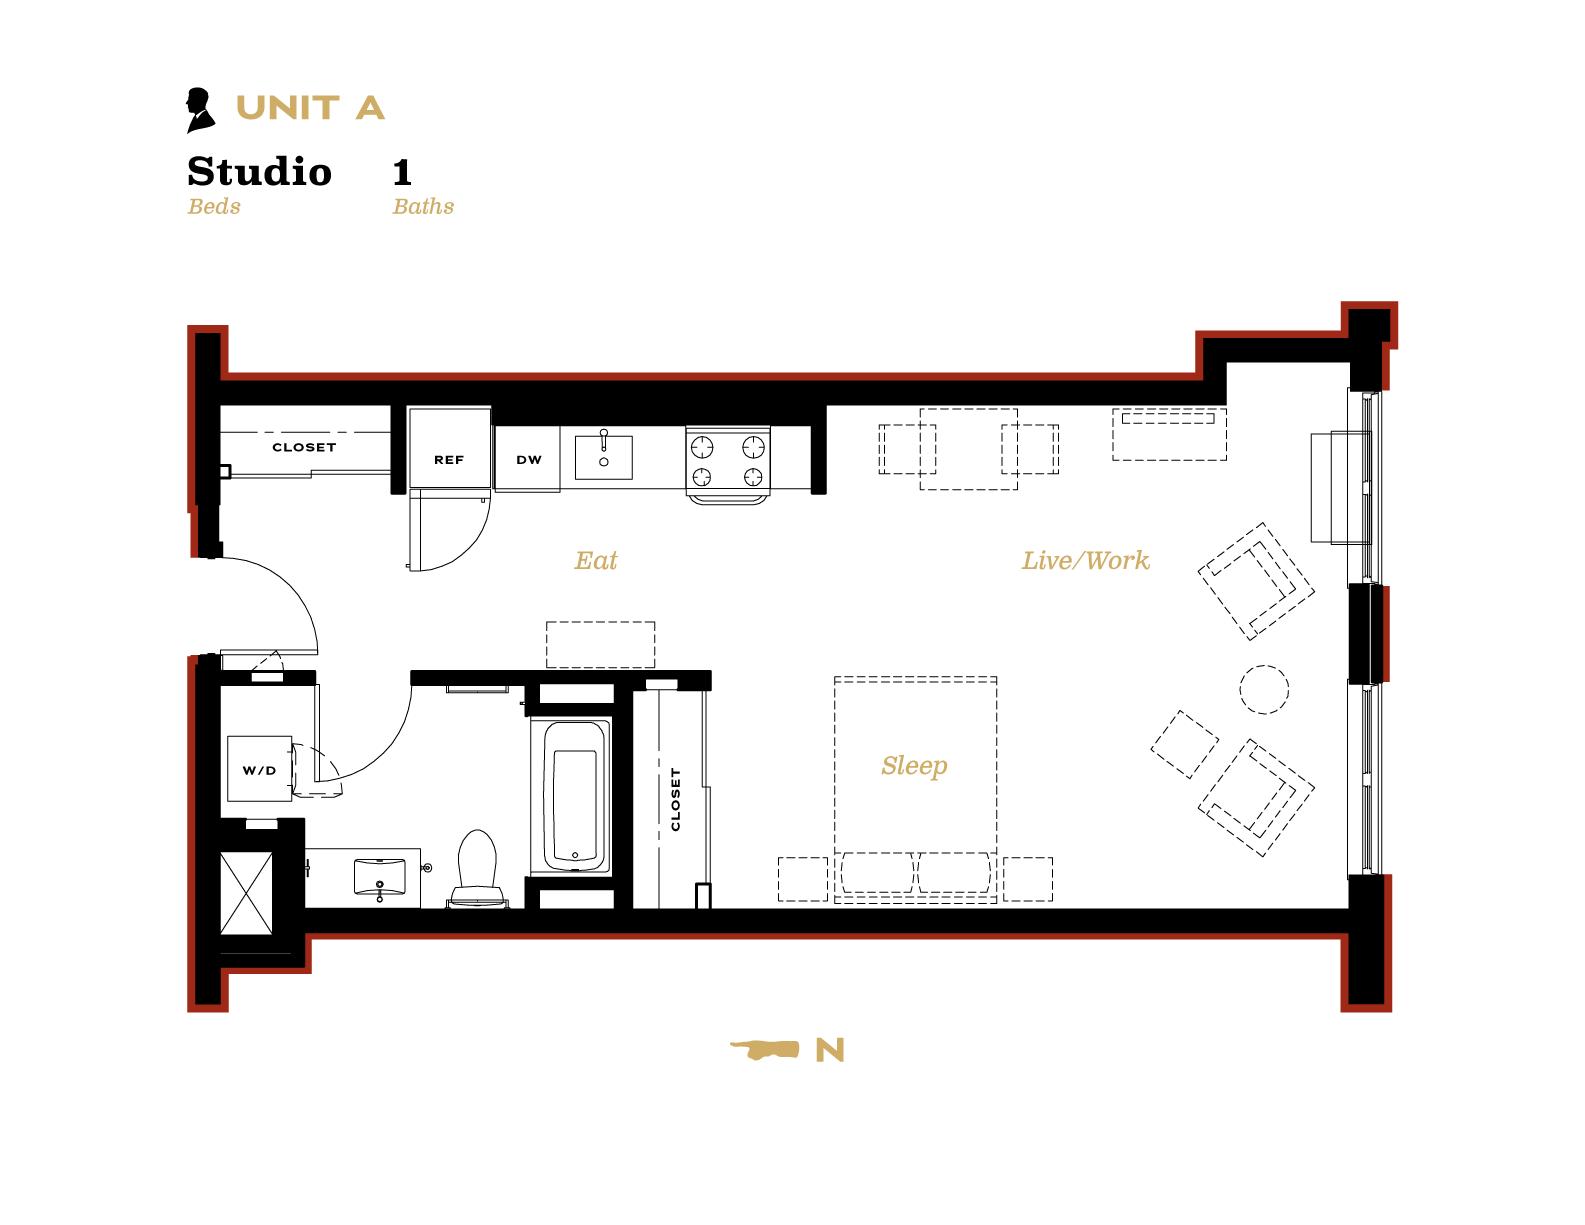 Unit A Studio with one bath floor plan